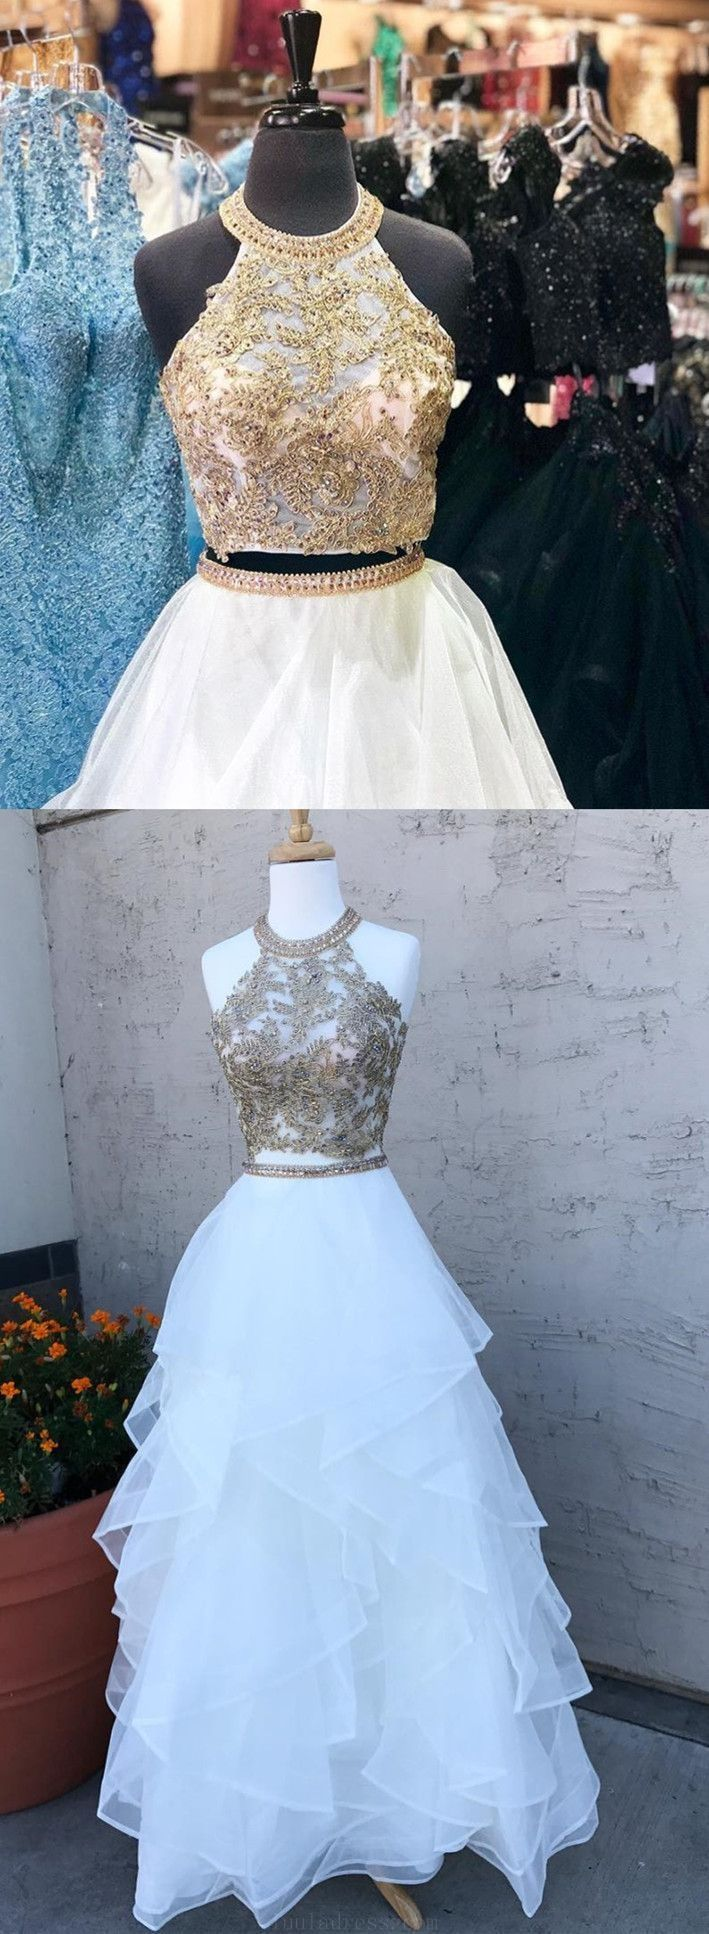 White prom dresses whitepromdresses prom dresses two piece